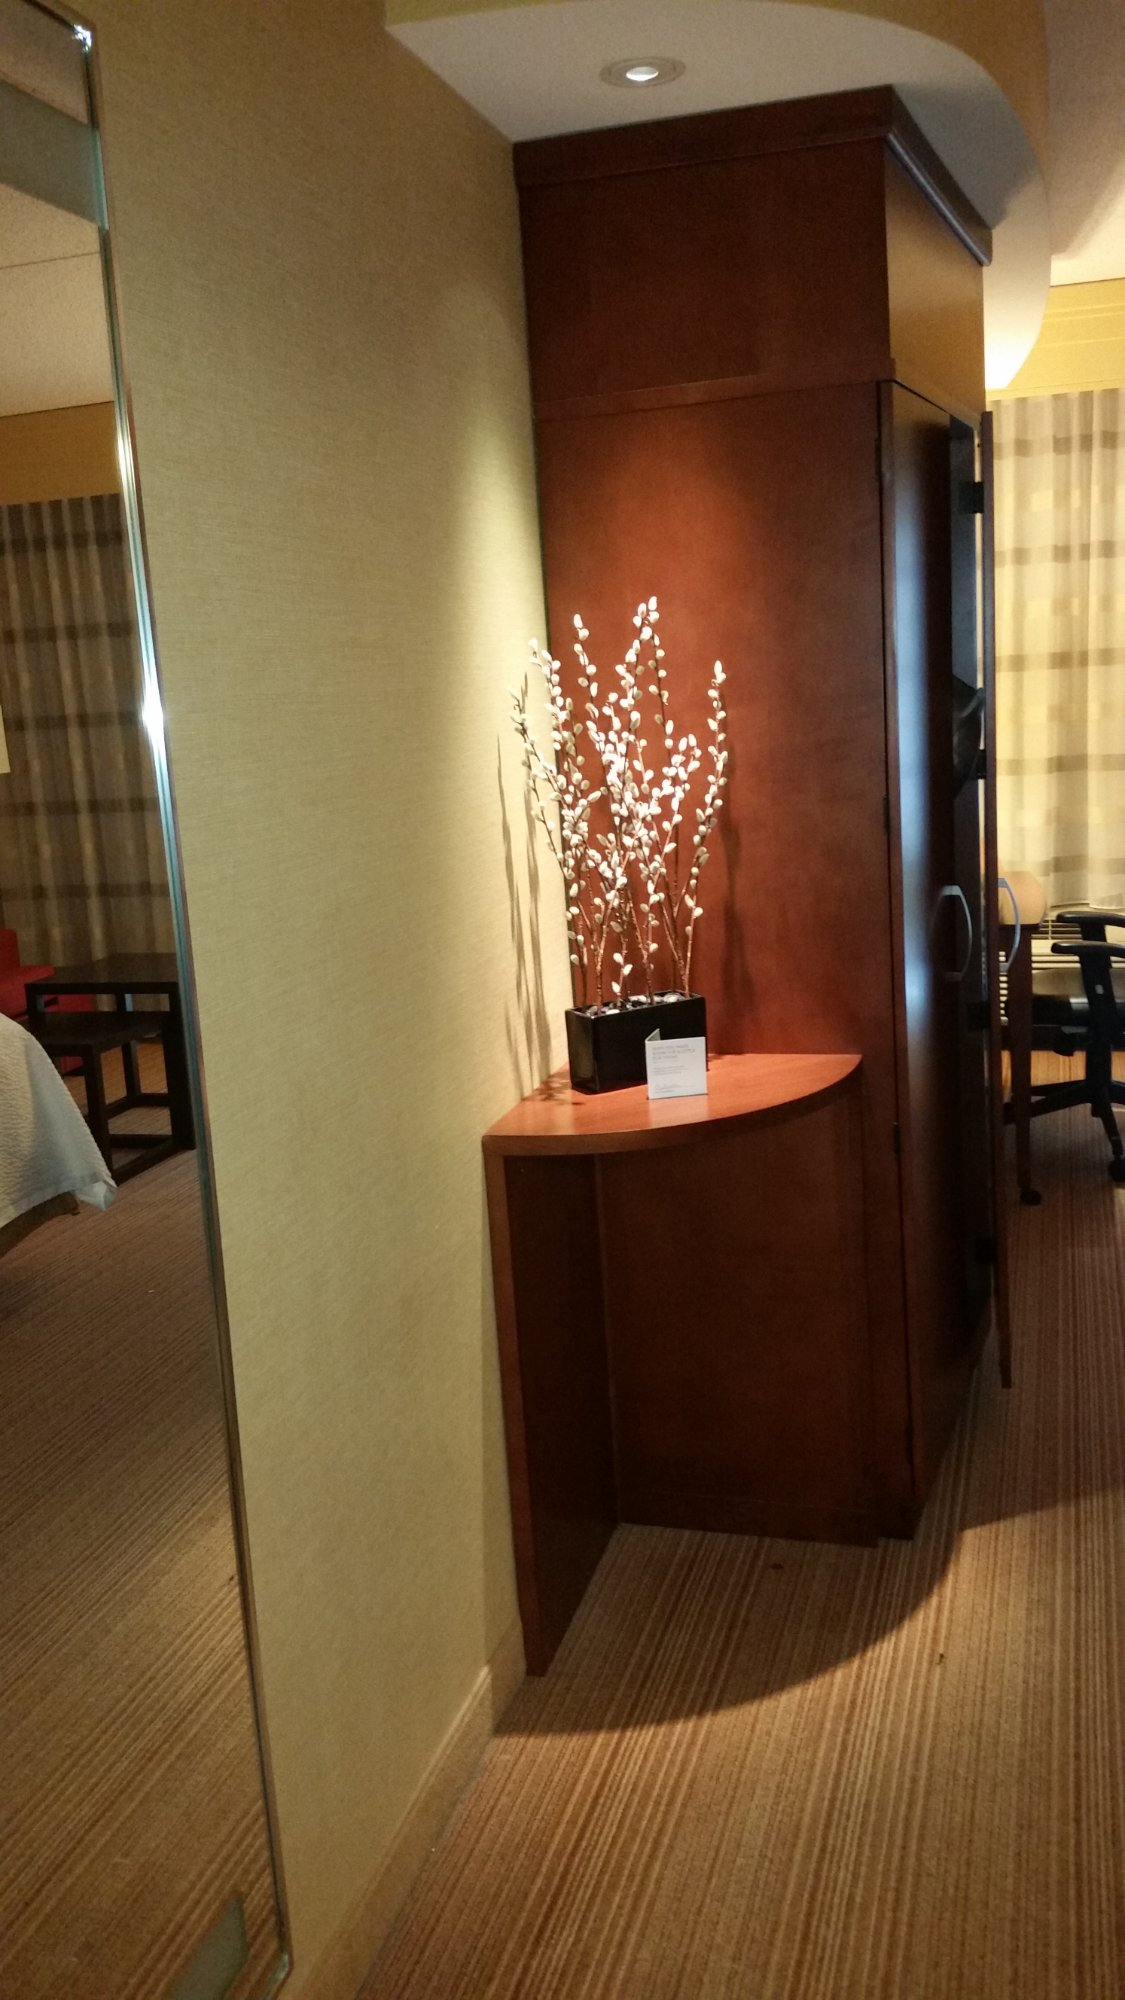 Courtyard Philadelphia Coatesville/Exton - UPDATED 2018 Prices u0026 Hotel Reviews (PA) - TripAdvisor & Courtyard Philadelphia Coatesville/Exton - UPDATED 2018 Prices ... azcodes.com